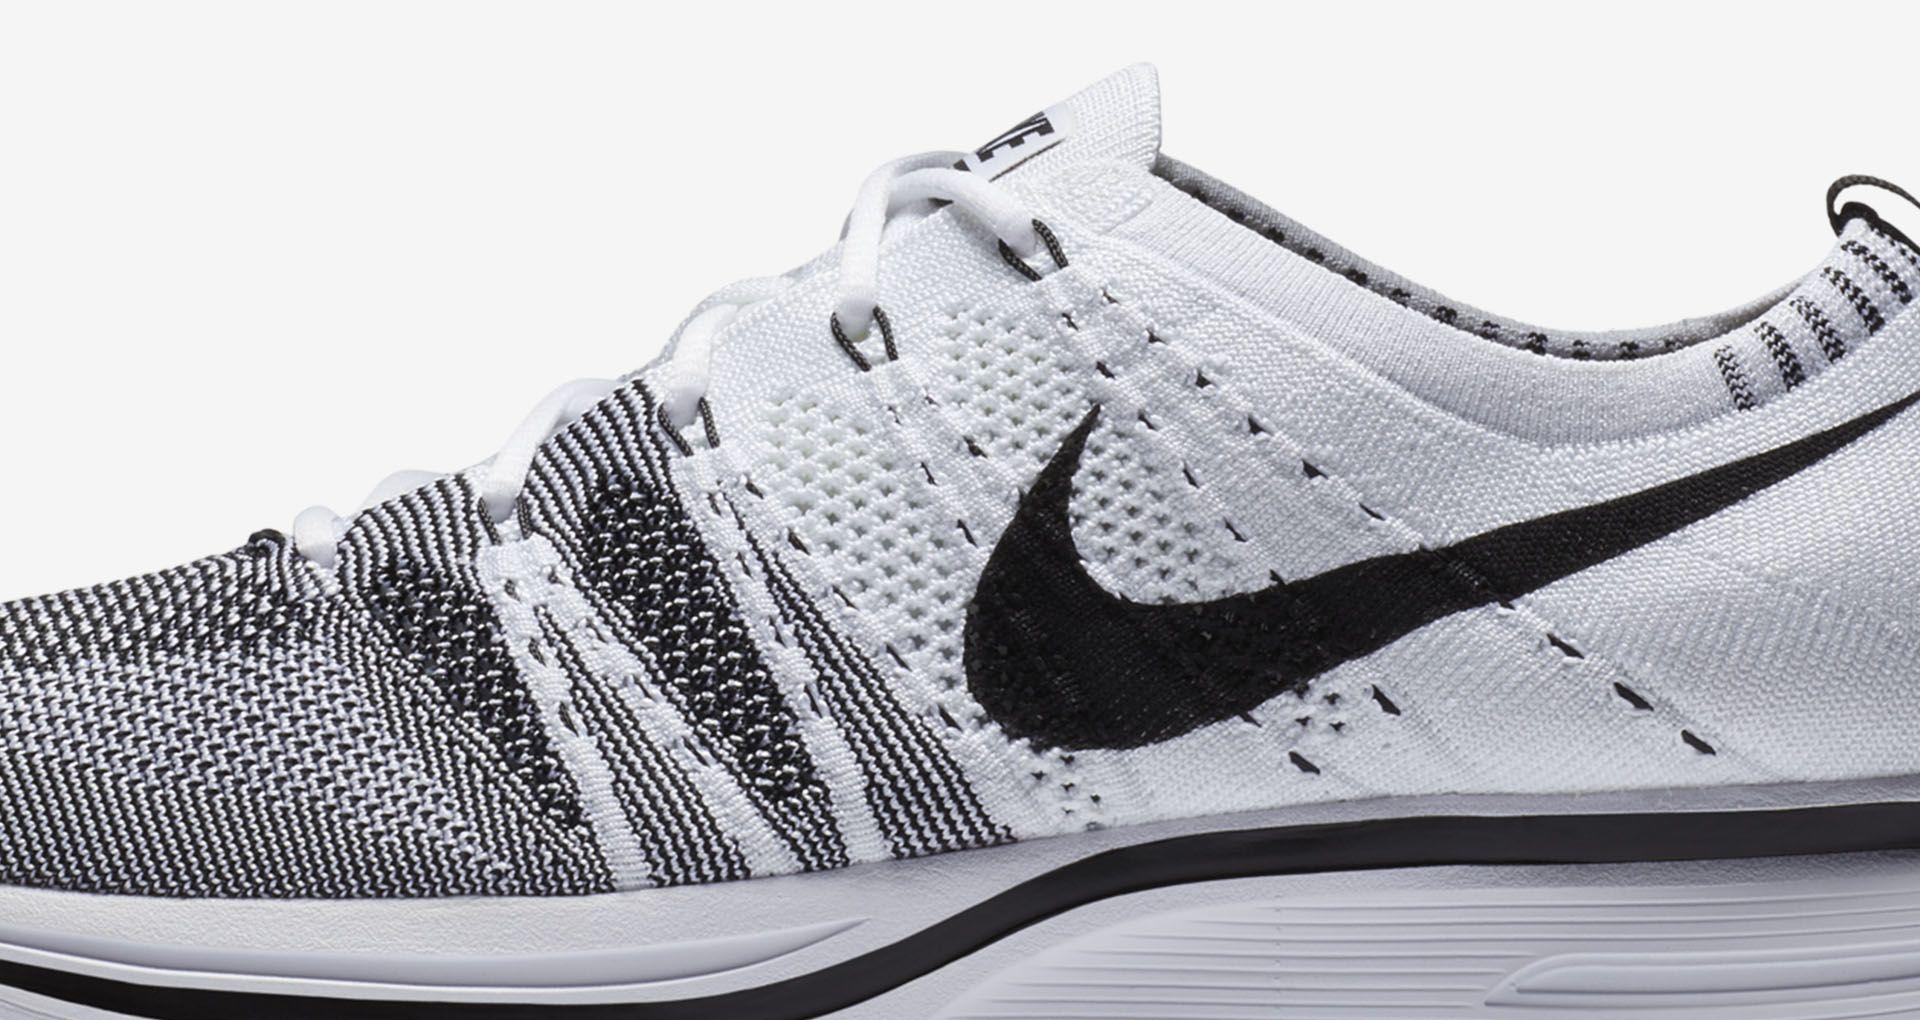 0465edcaa3643 Nike Flyknit Trainer  White   Black . Nike+ SNKRS